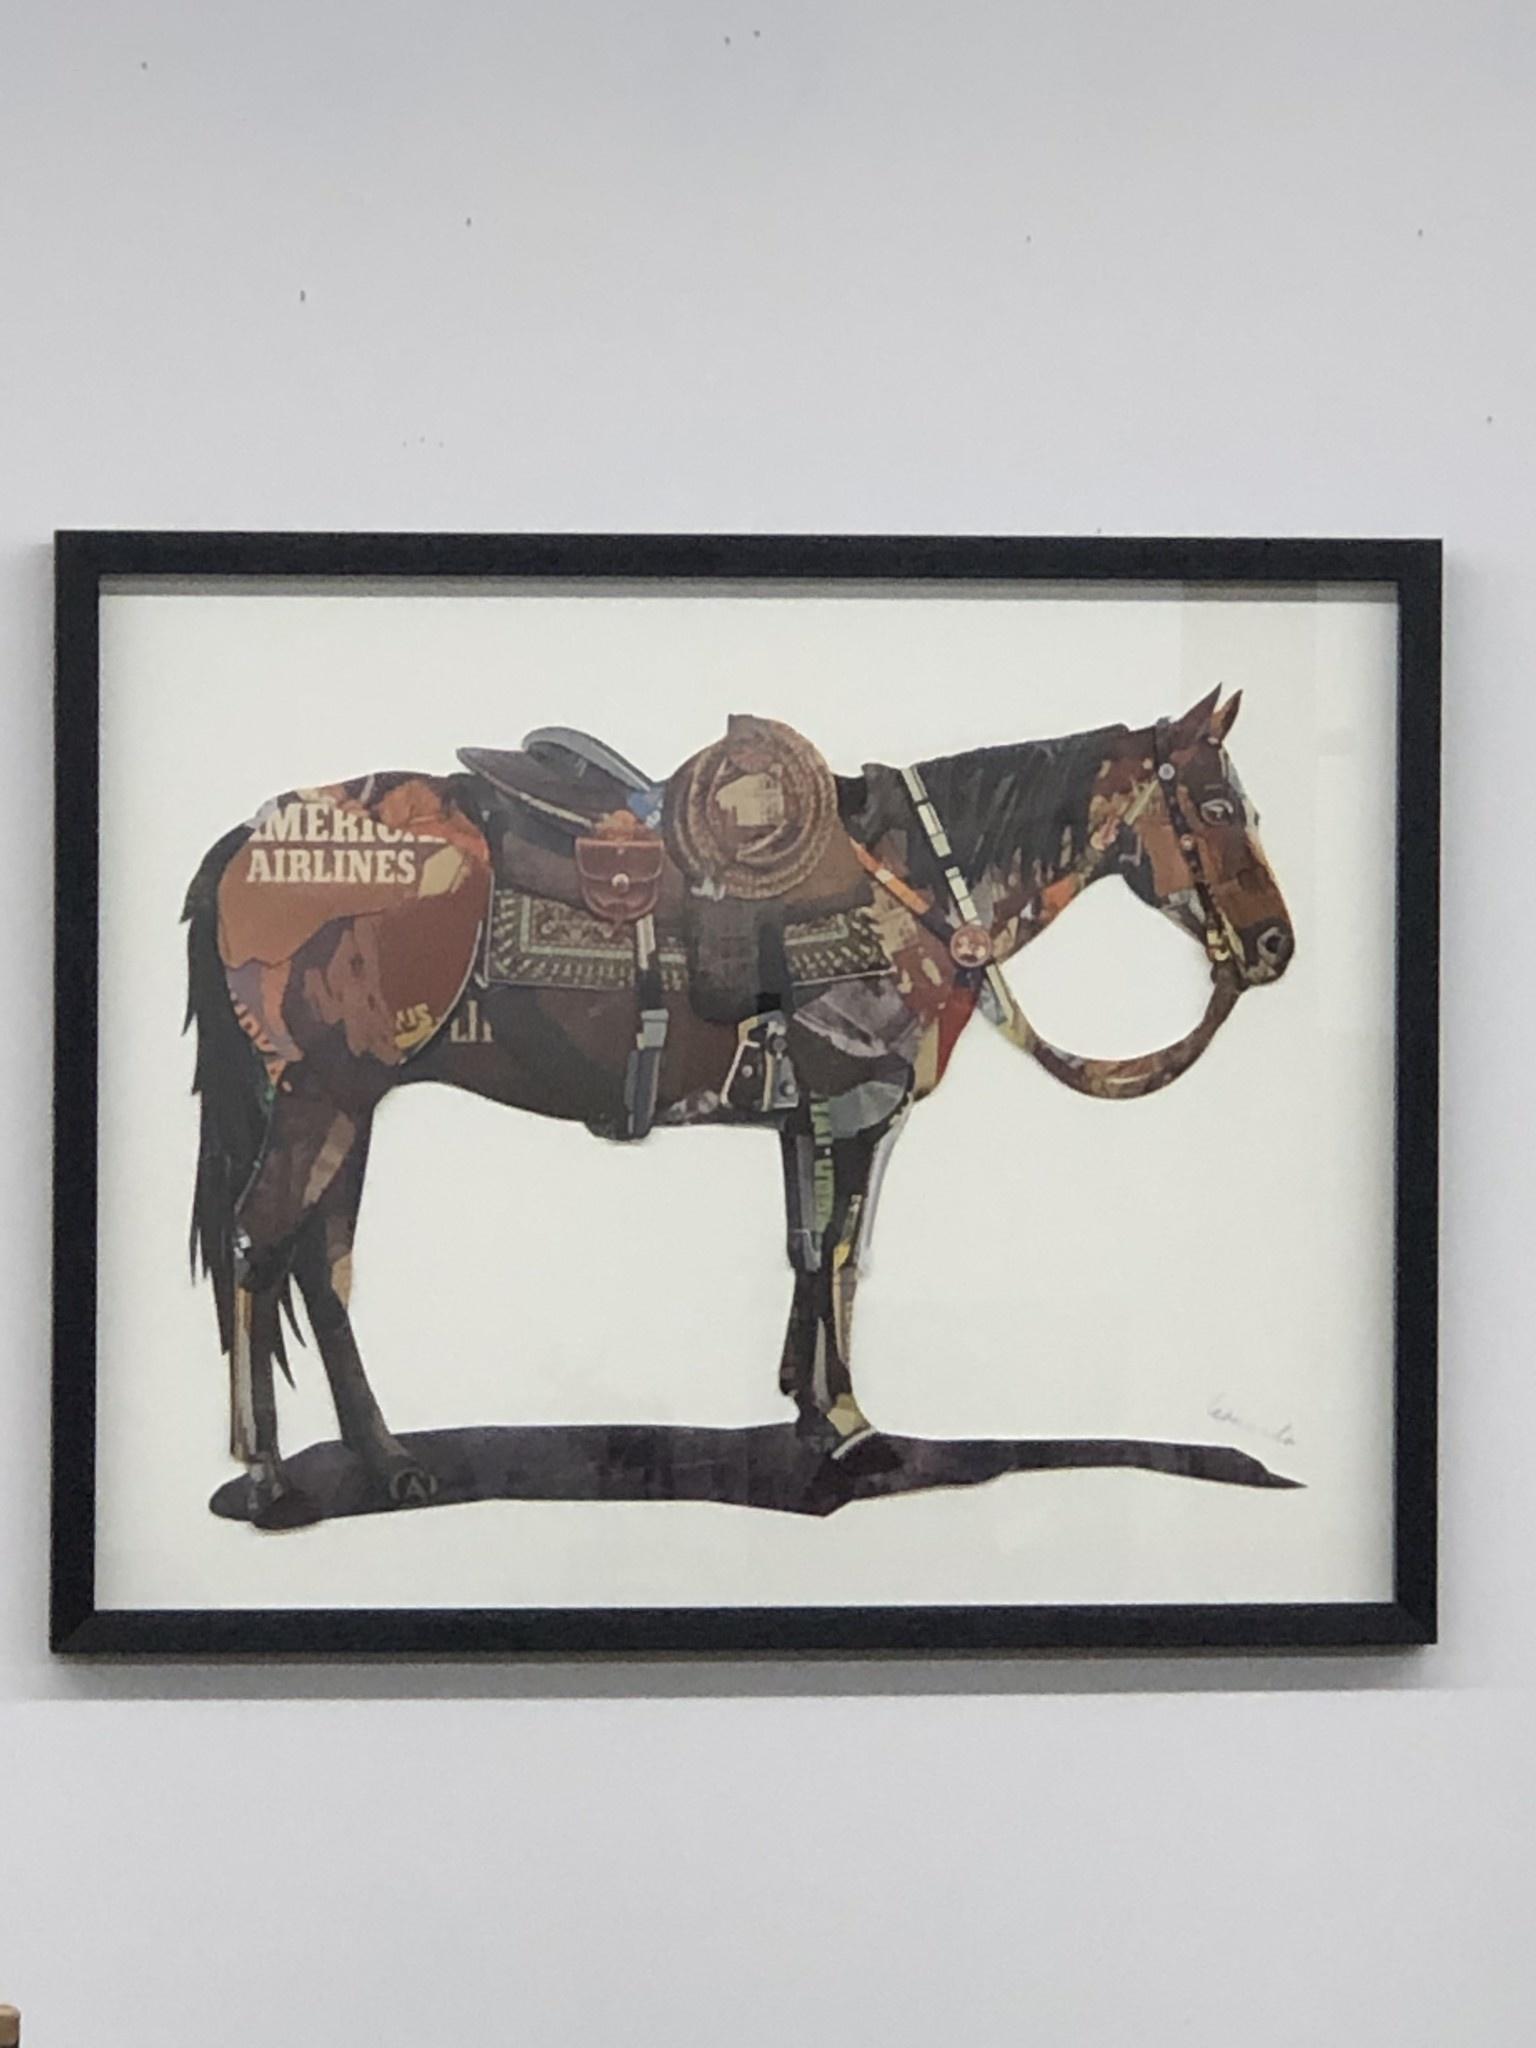 Simpkins-Canterbury Lane Collage 3D Art-Horse with Saddle